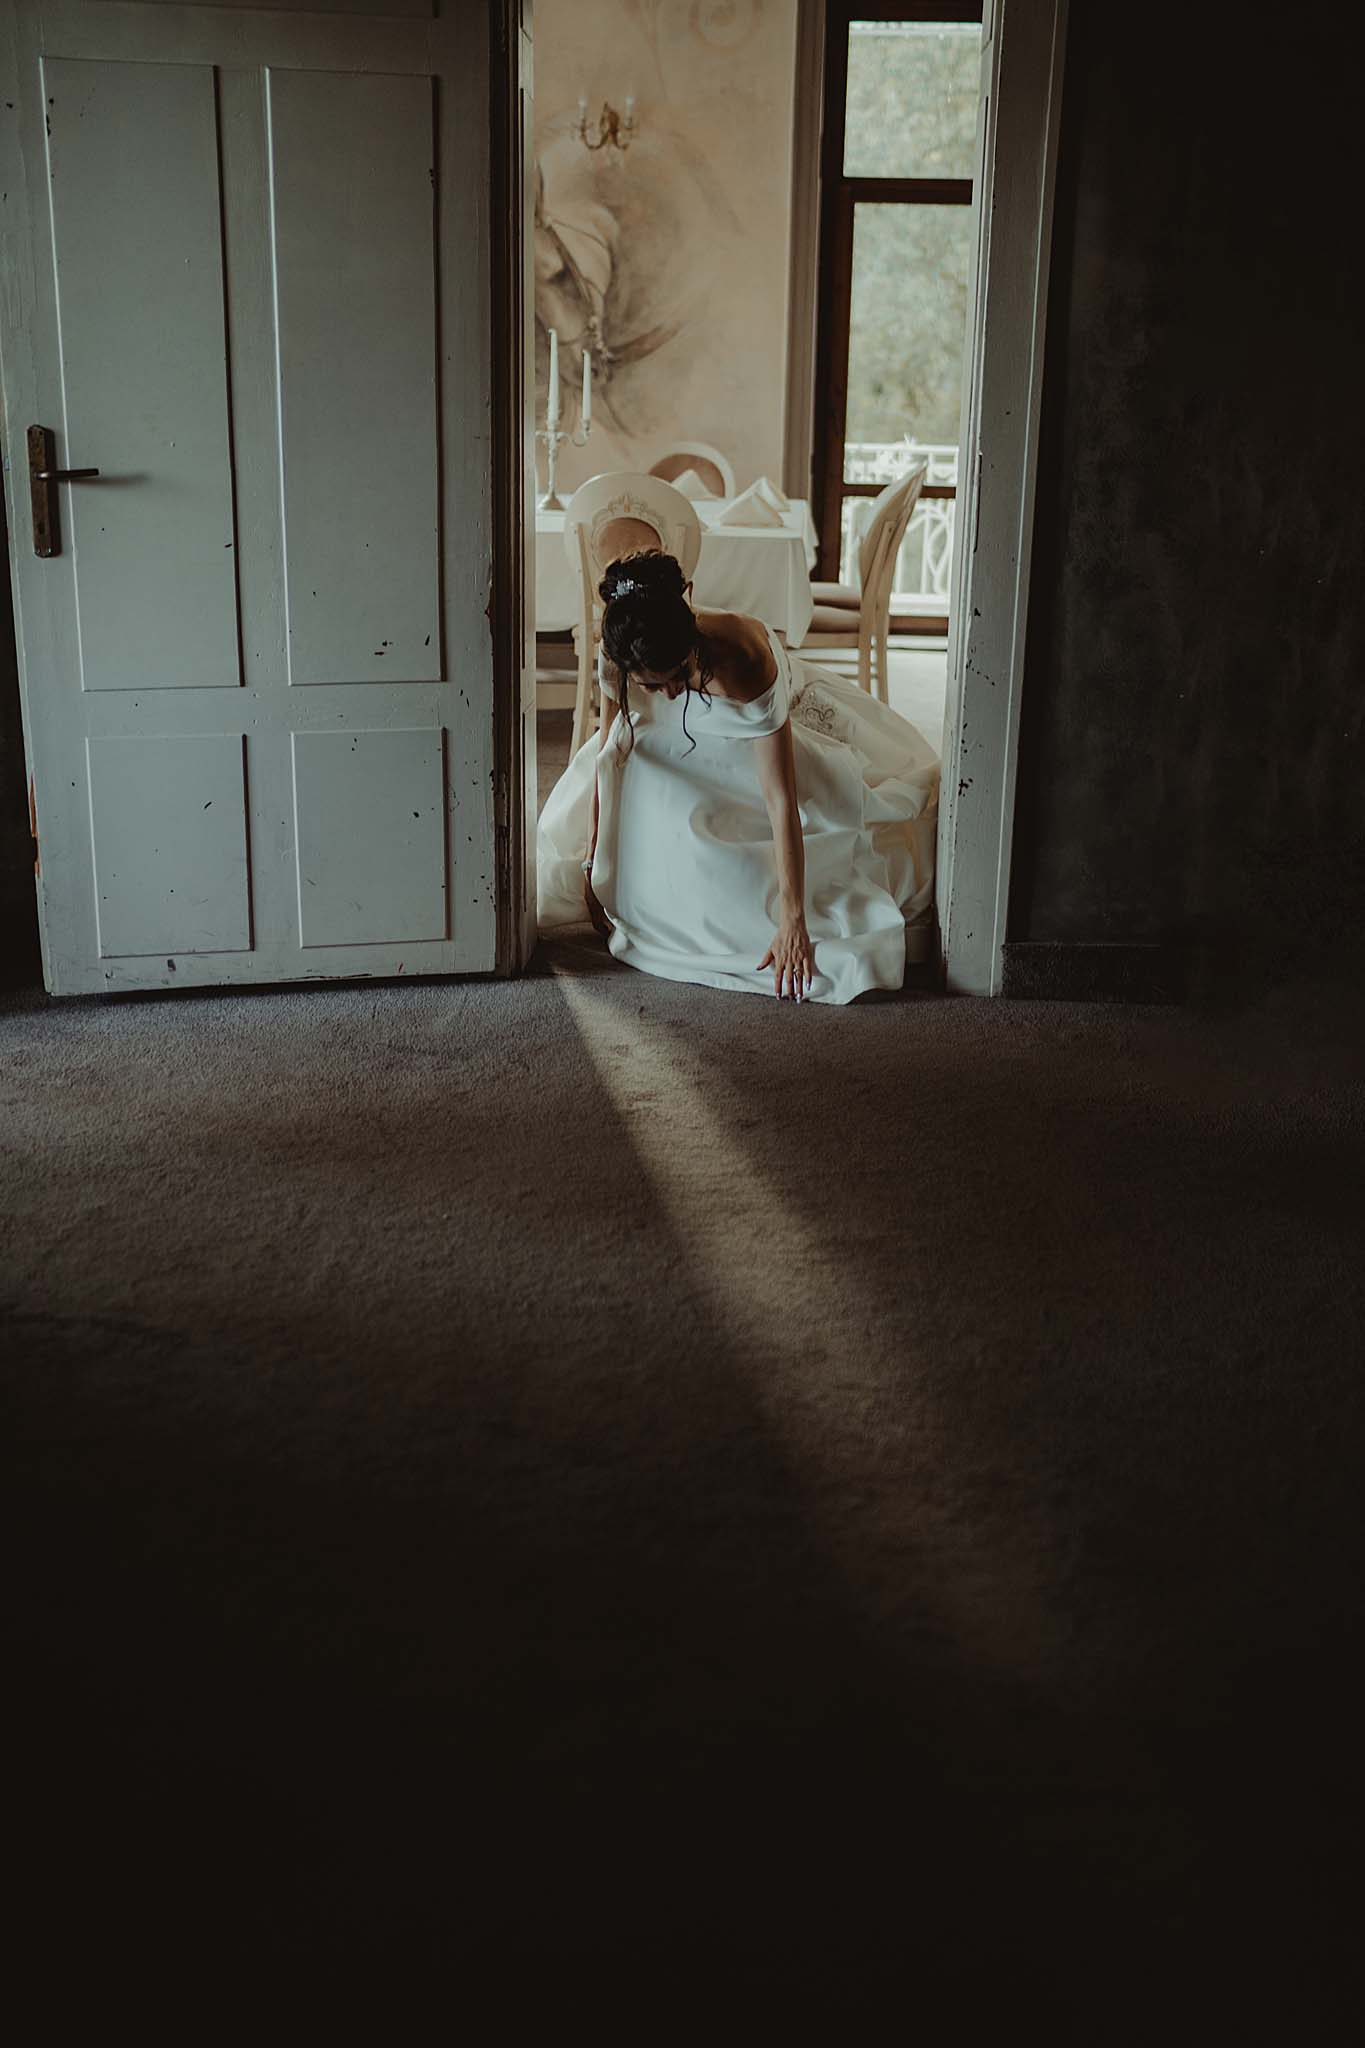 Photographer Bulgaria, destination wedding, wedding in Bulgaria, wedding photographer Bulgaria, wedding photographer, wedding photography, boho wedding, elopement, intimate wedding, wedding destination Bulgaria, elopement in Bulgaria, indie wedding, wedding ideas